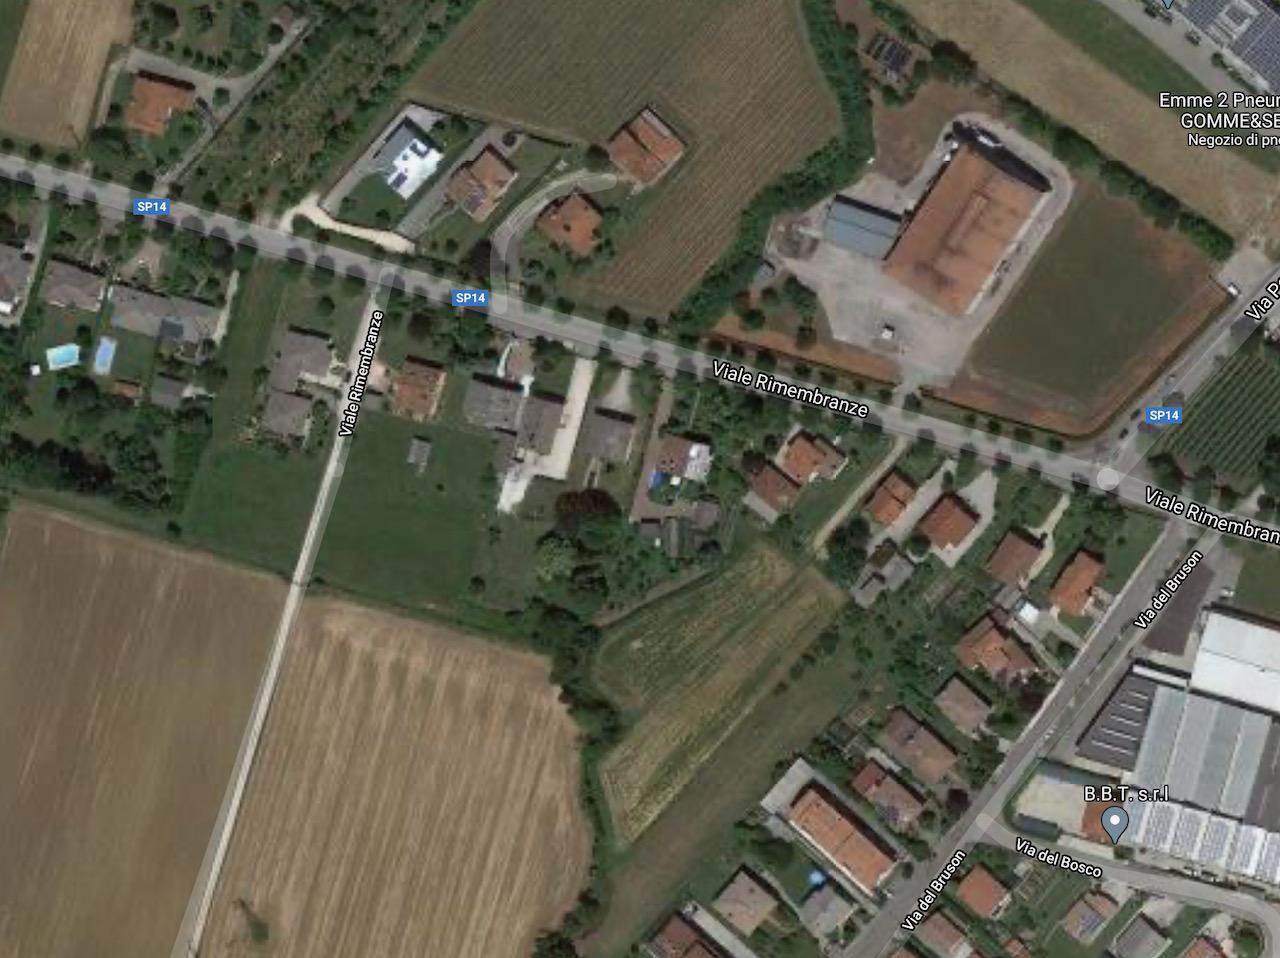 Terreno edificabile, in zona residenziale.